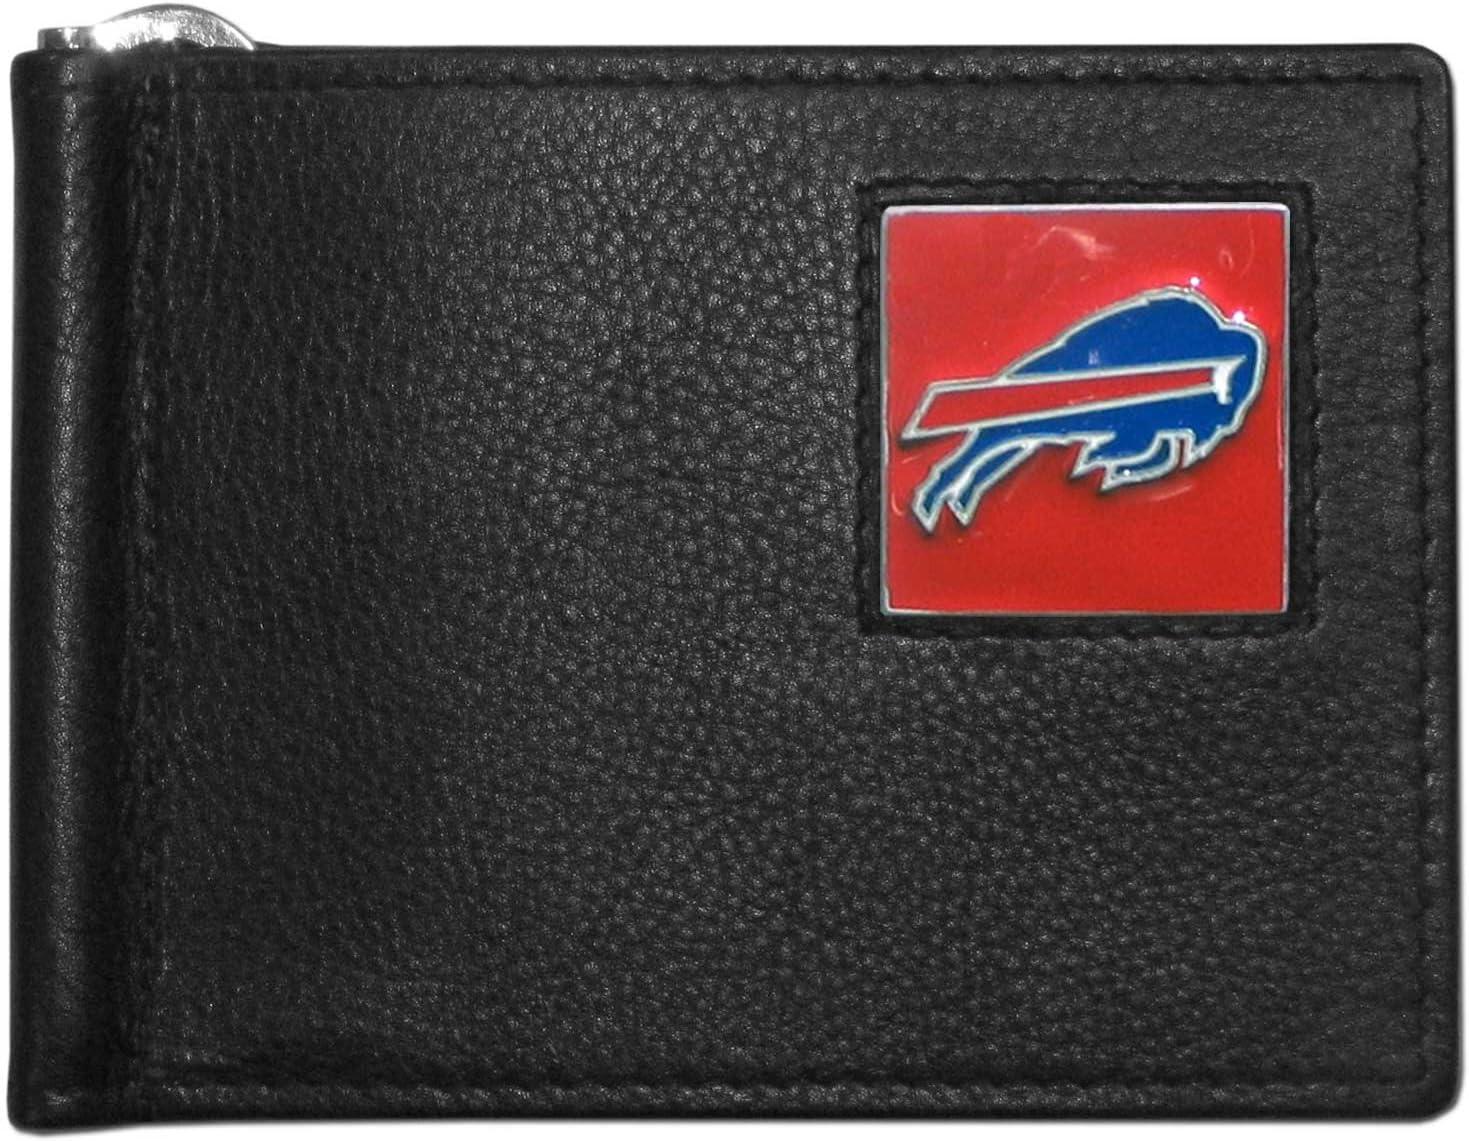 Siskiyou NFL Leather Bill Clip Wallet